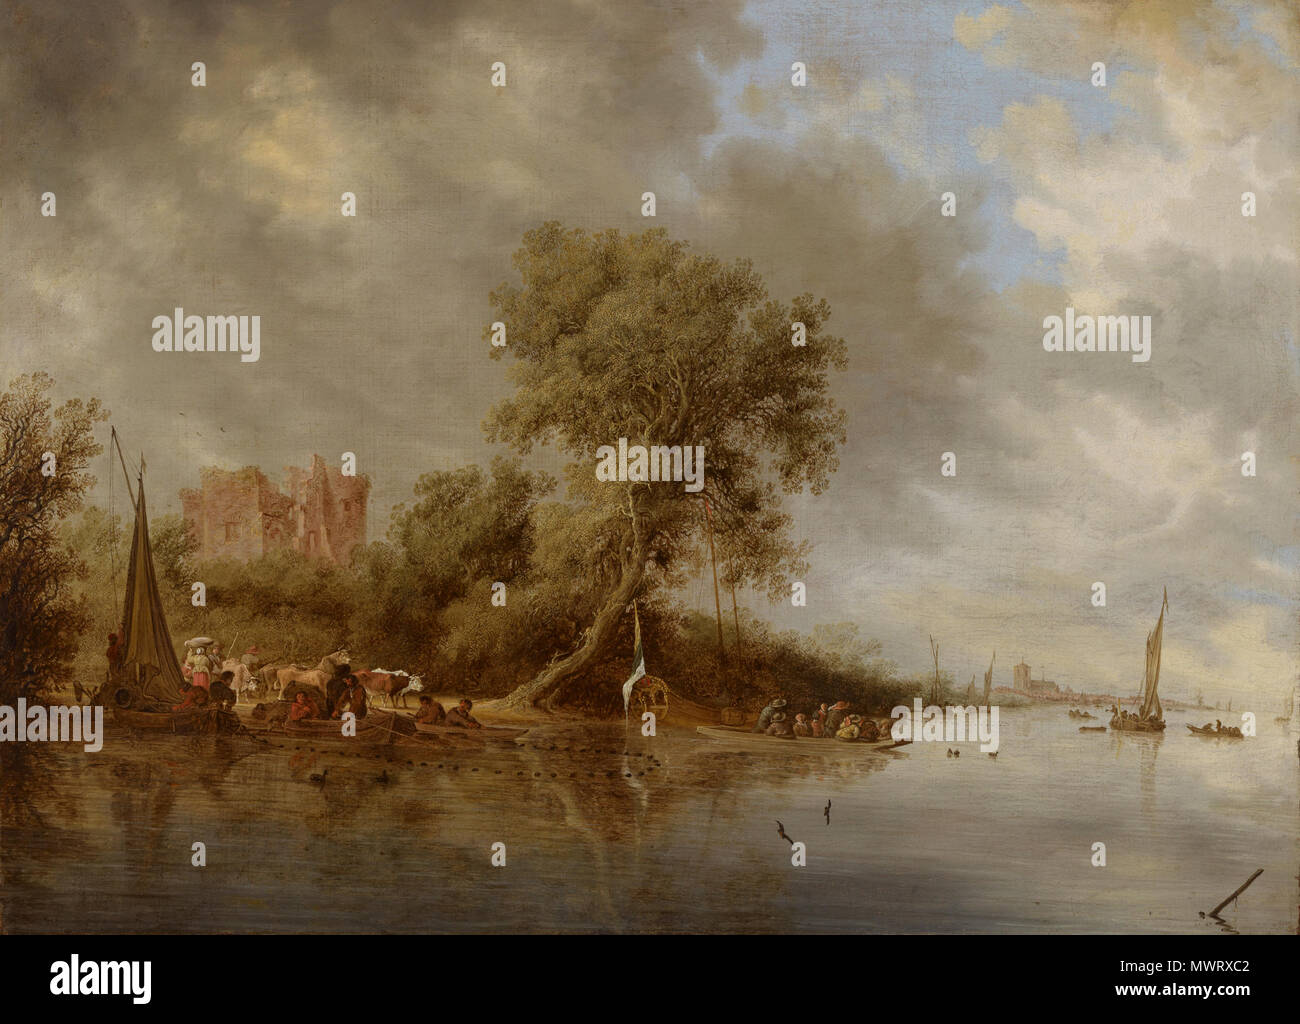 540 Salomon Jacobsz. van Ruysdael (1600-1603–1670)- River Landscape with the Ruins of the Castle of Egmond - Jokimaisema, Egmondin linnan raunio - Flodlandskap, slottet Egmonds ruiner (28845490893) Stock Photo